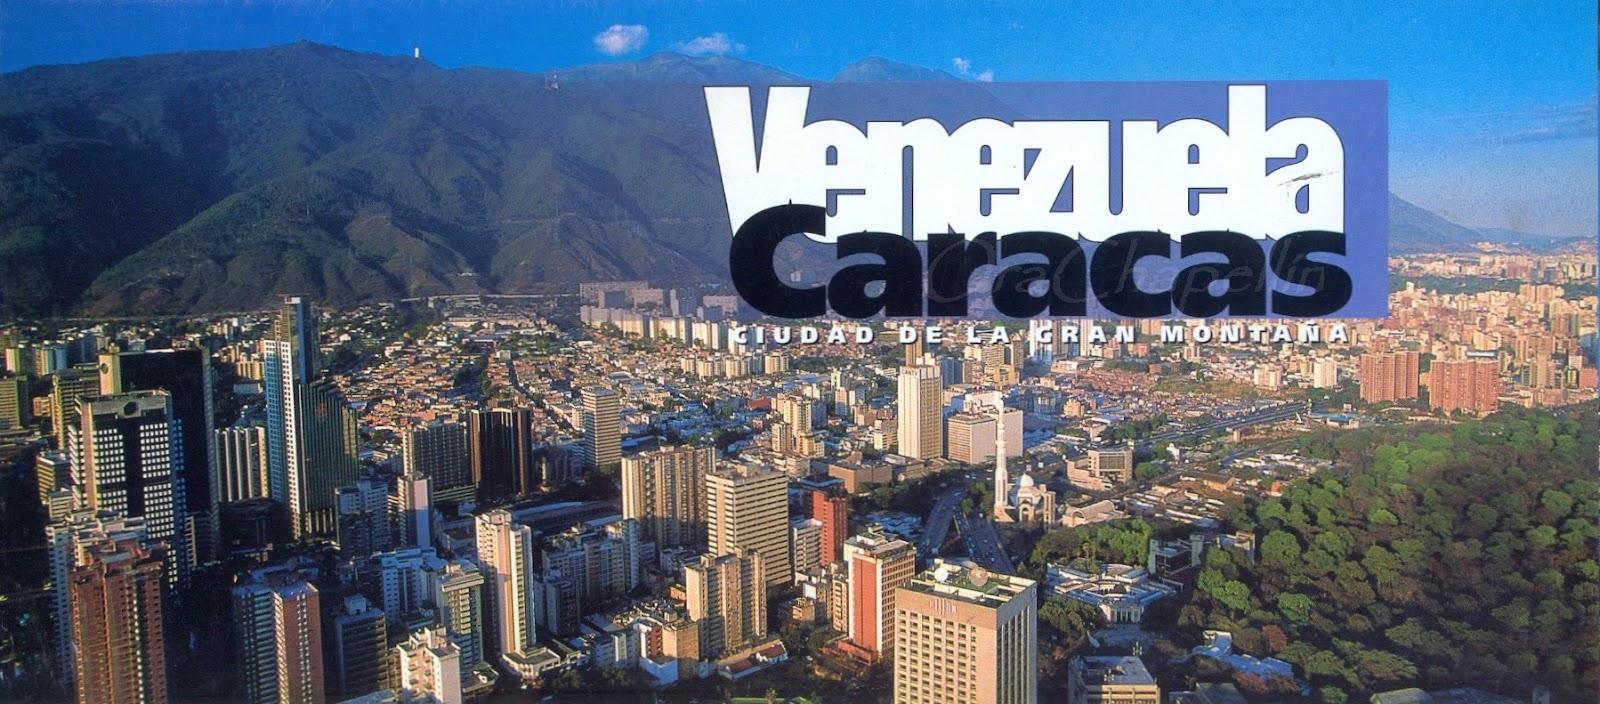 Caracas Venezuela  city photos : Caracas Venezuela Ora